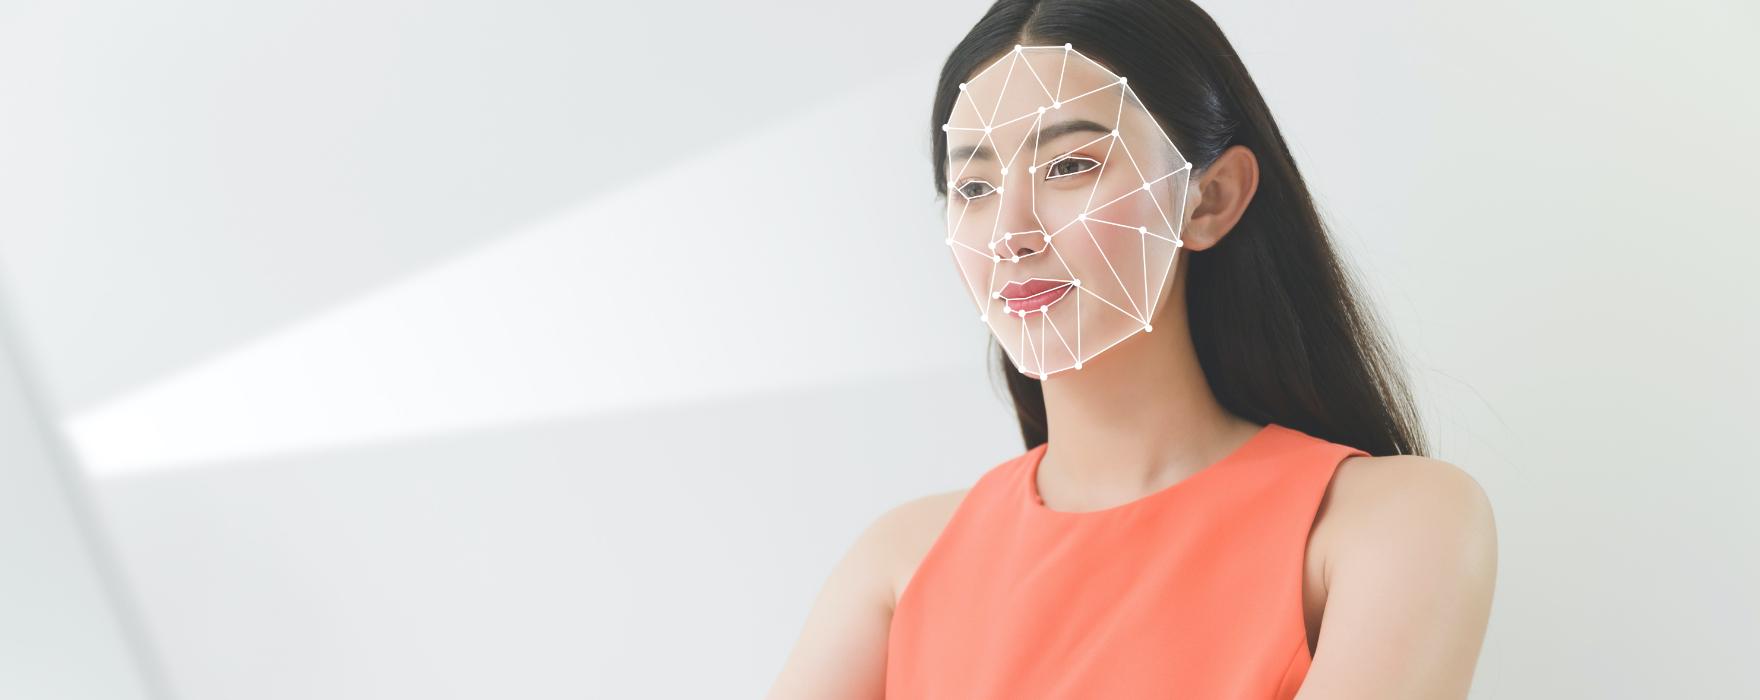 AI研究開発からUnity開発まで、幅広く先端技術に対応<